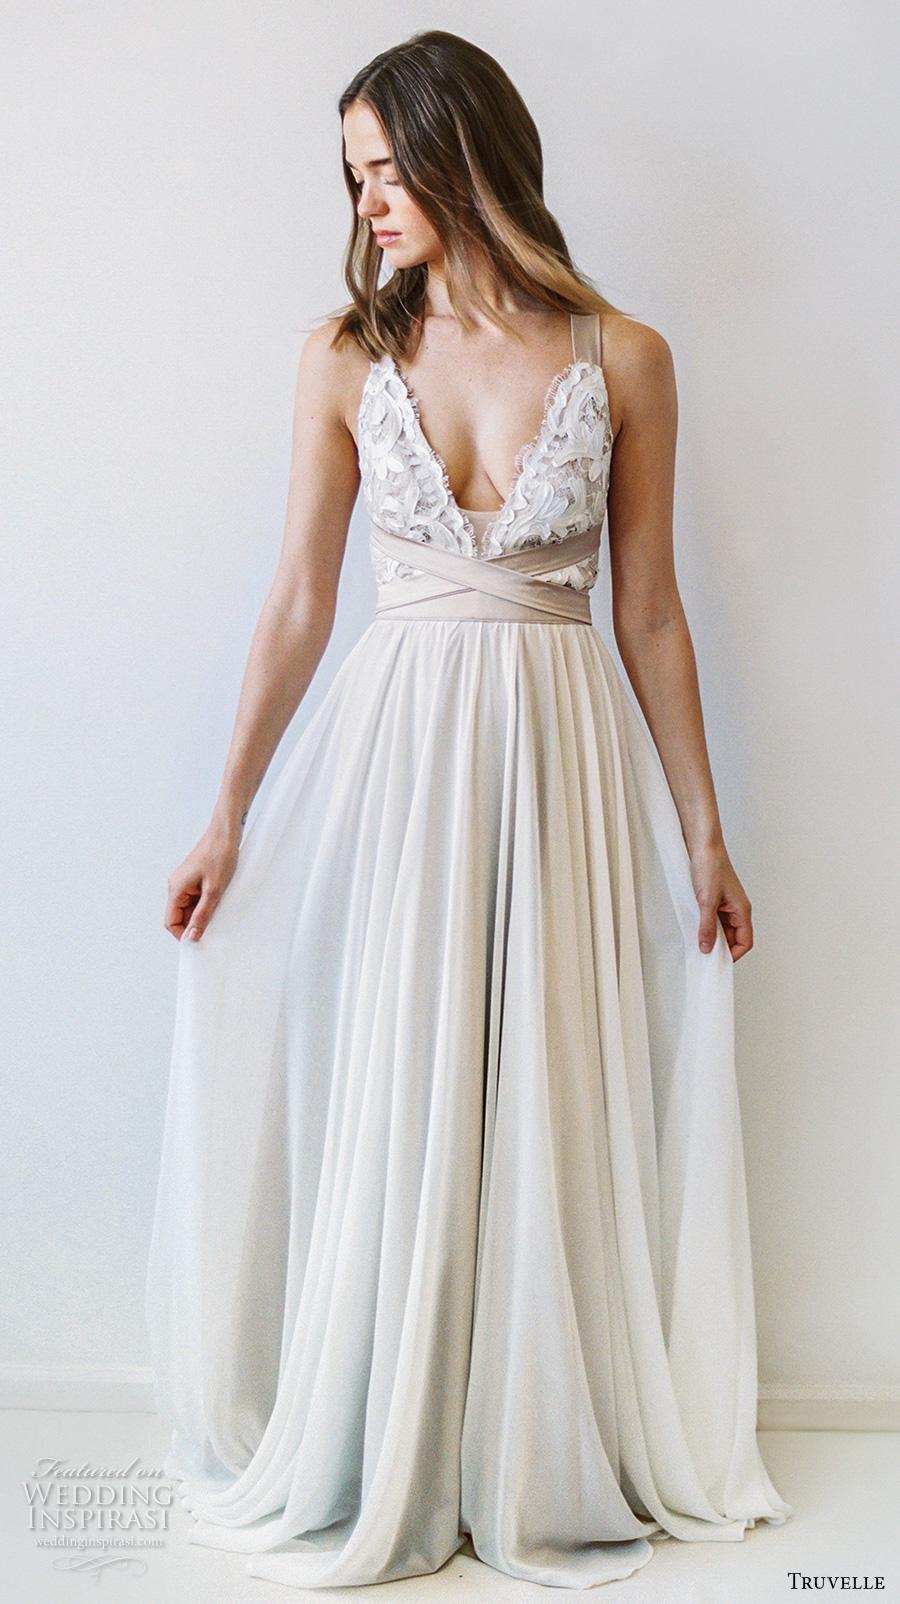 Truvelle 2017 Wedding Dresses Wedding Inspirasi